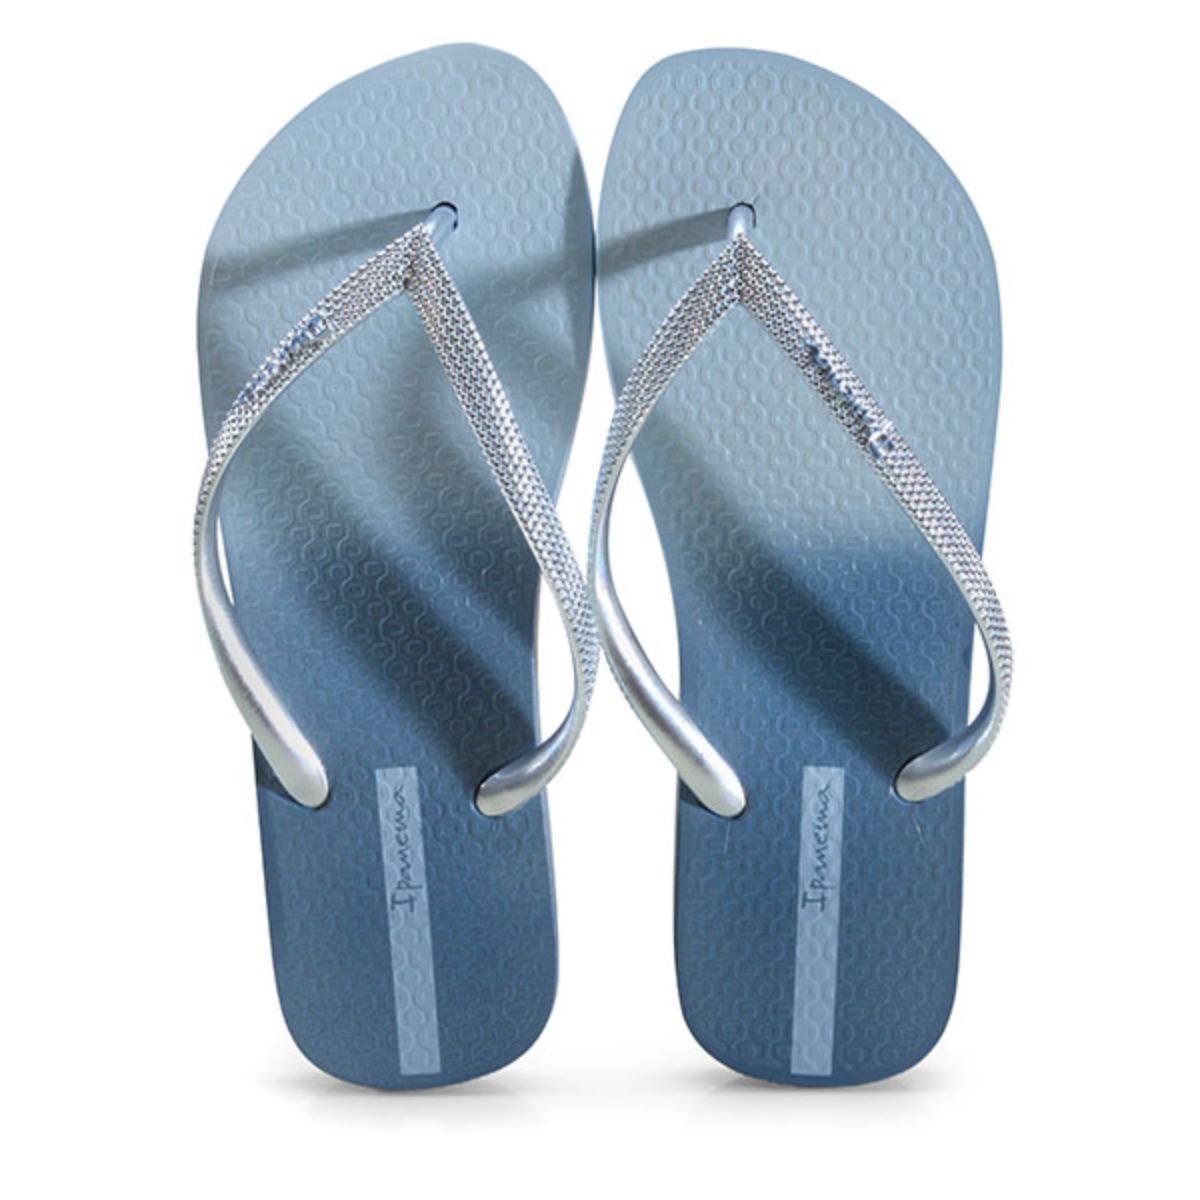 Chinelo Feminino Grendene 26580 25385 Ipanema Blush Azul Metalizado